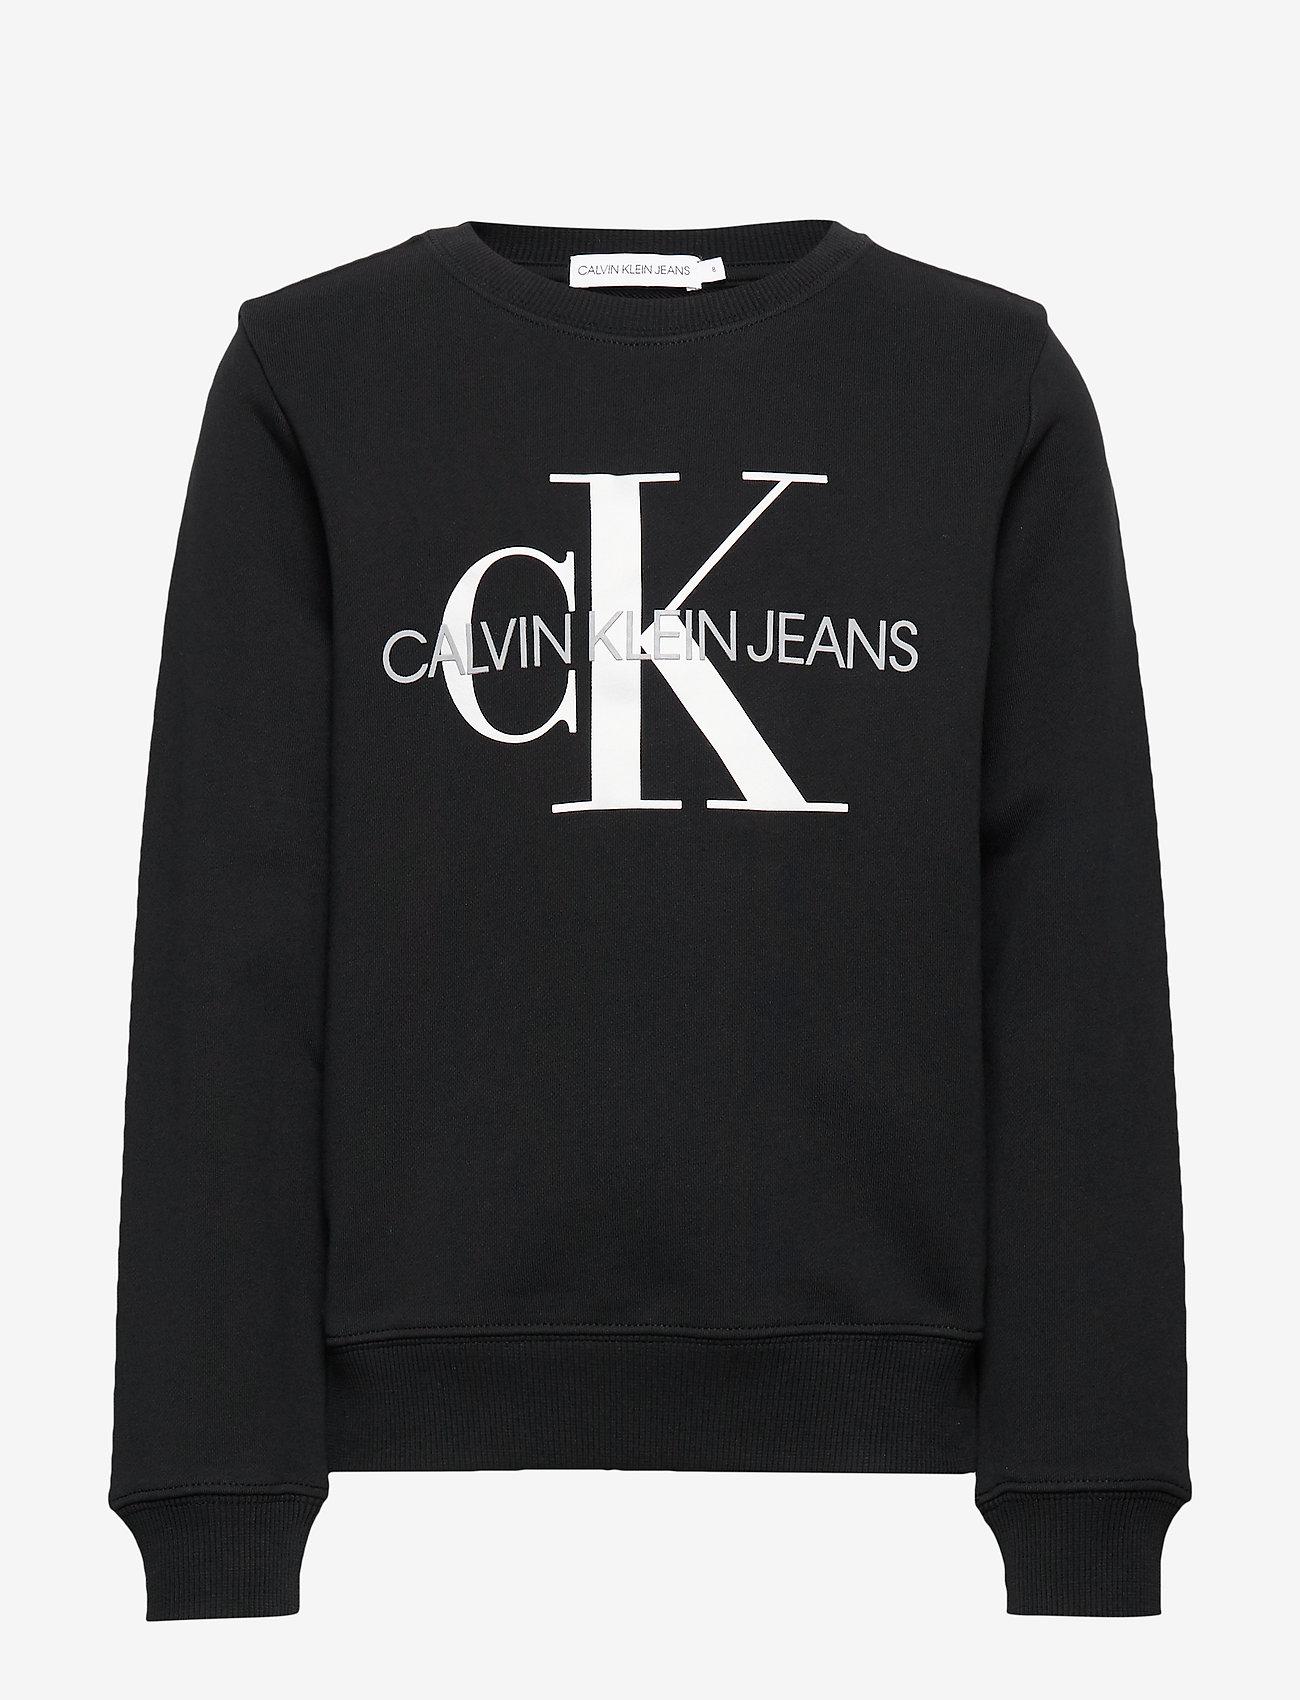 Calvin Klein - MONOGRAM LOGO SWEATSHIRT - sweatshirts - ck black - 0